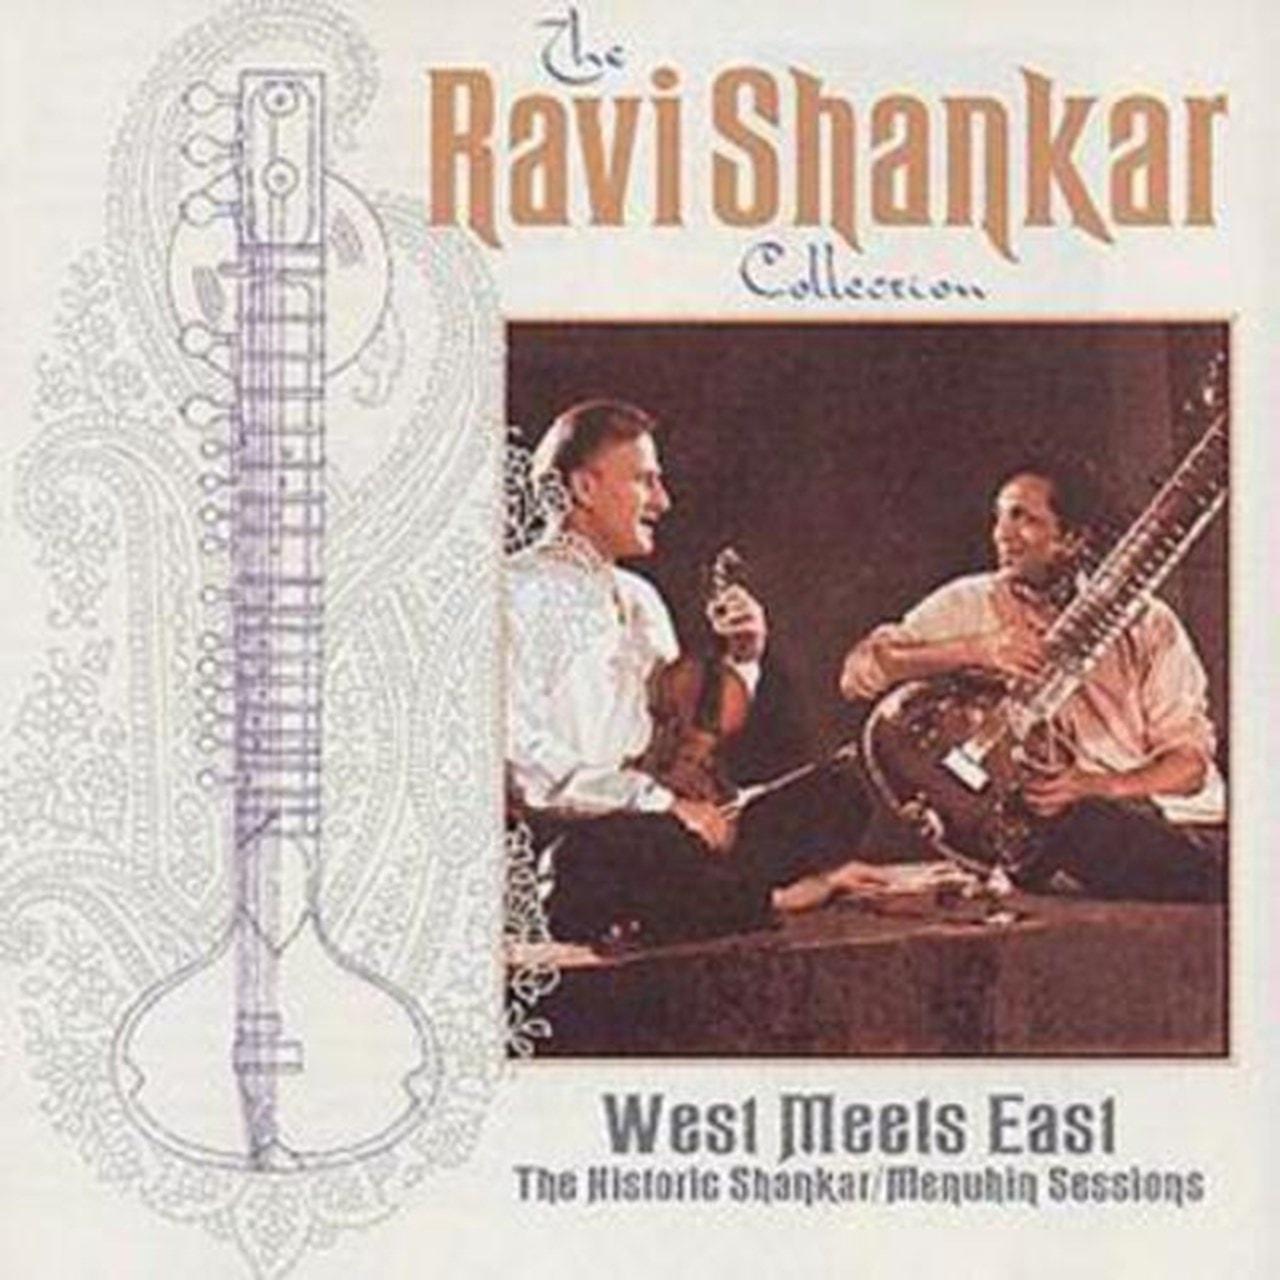 West Meets East: The Historic Shankar/Menuhin Sessions - 1